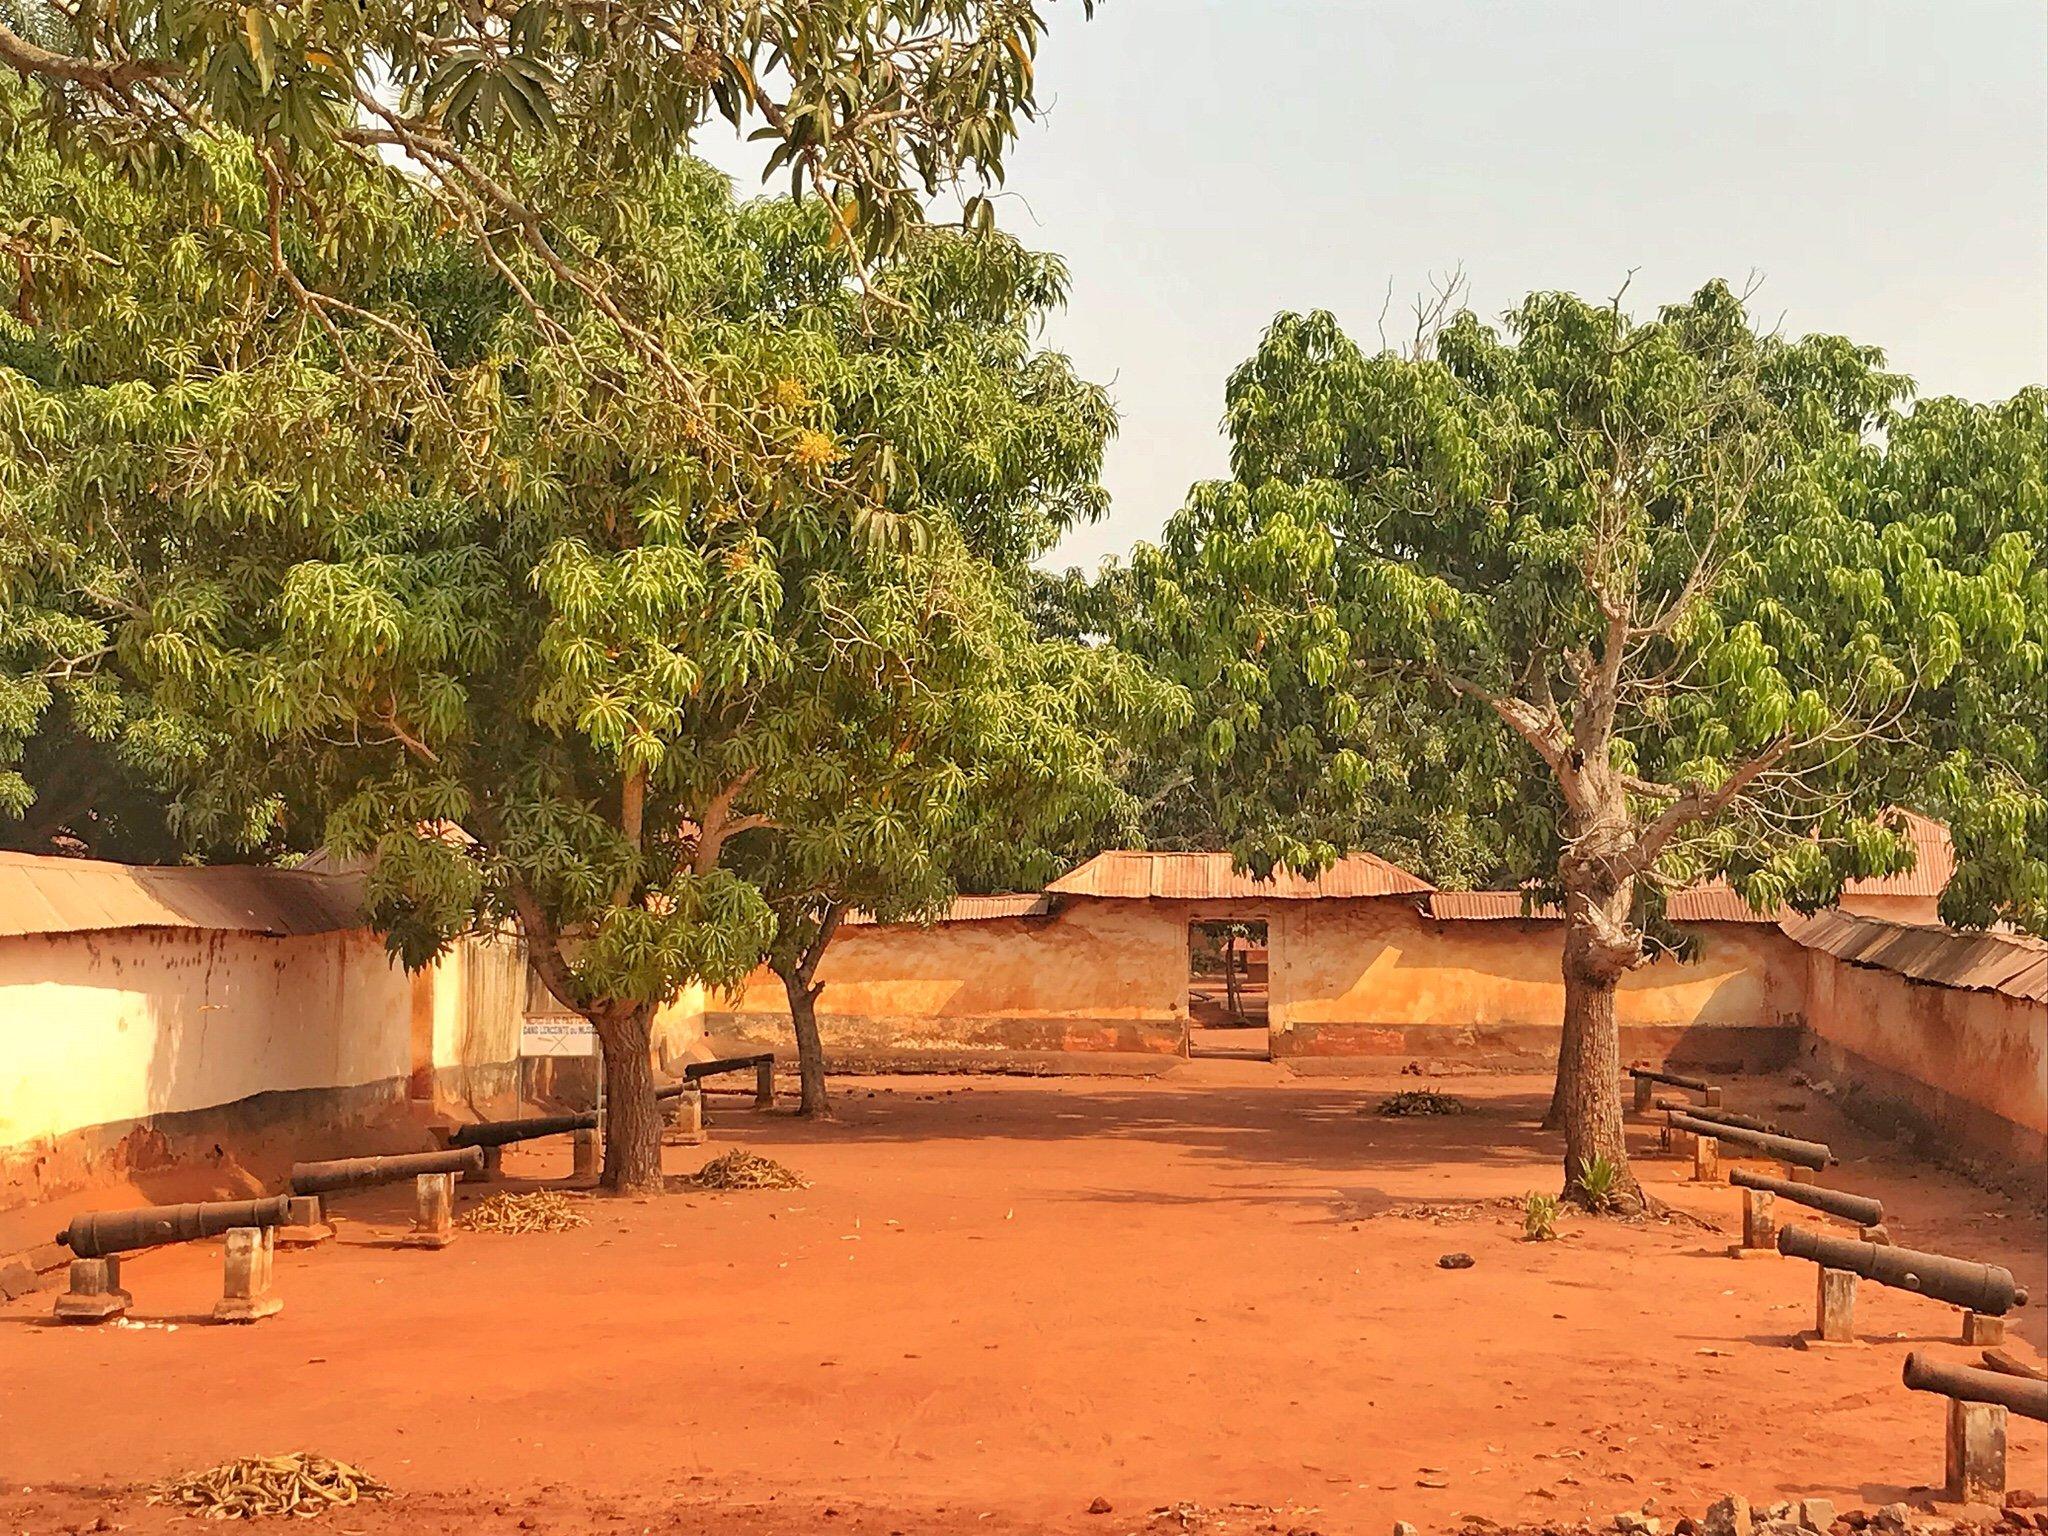 Dahomey Palaces, Abomey, Benin